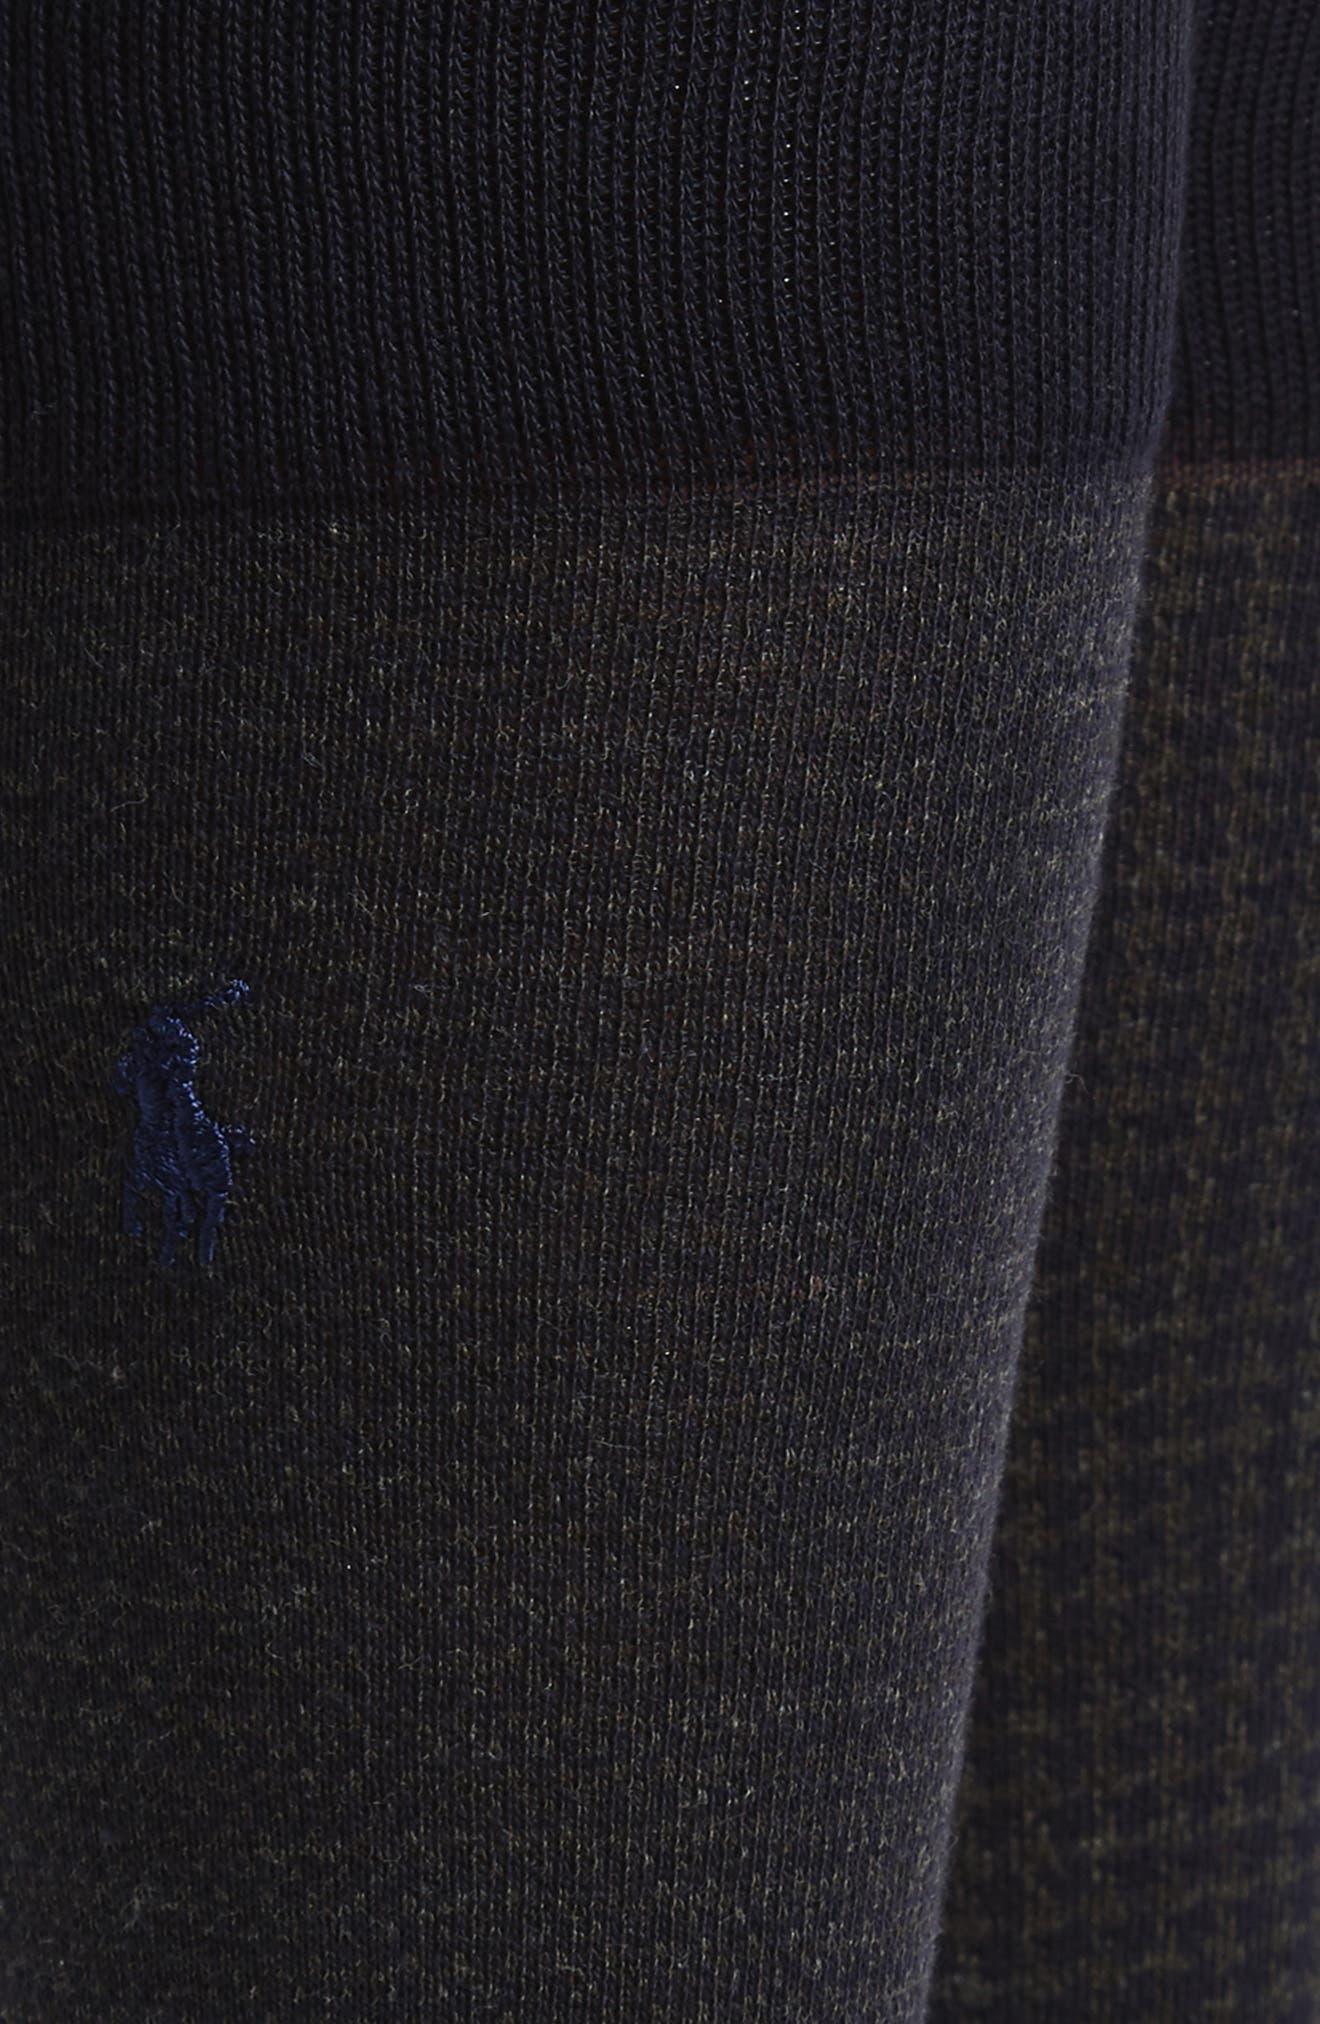 2-Pack Assorted Houndstooth Dress Socks,                             Alternate thumbnail 2, color,                             Navy